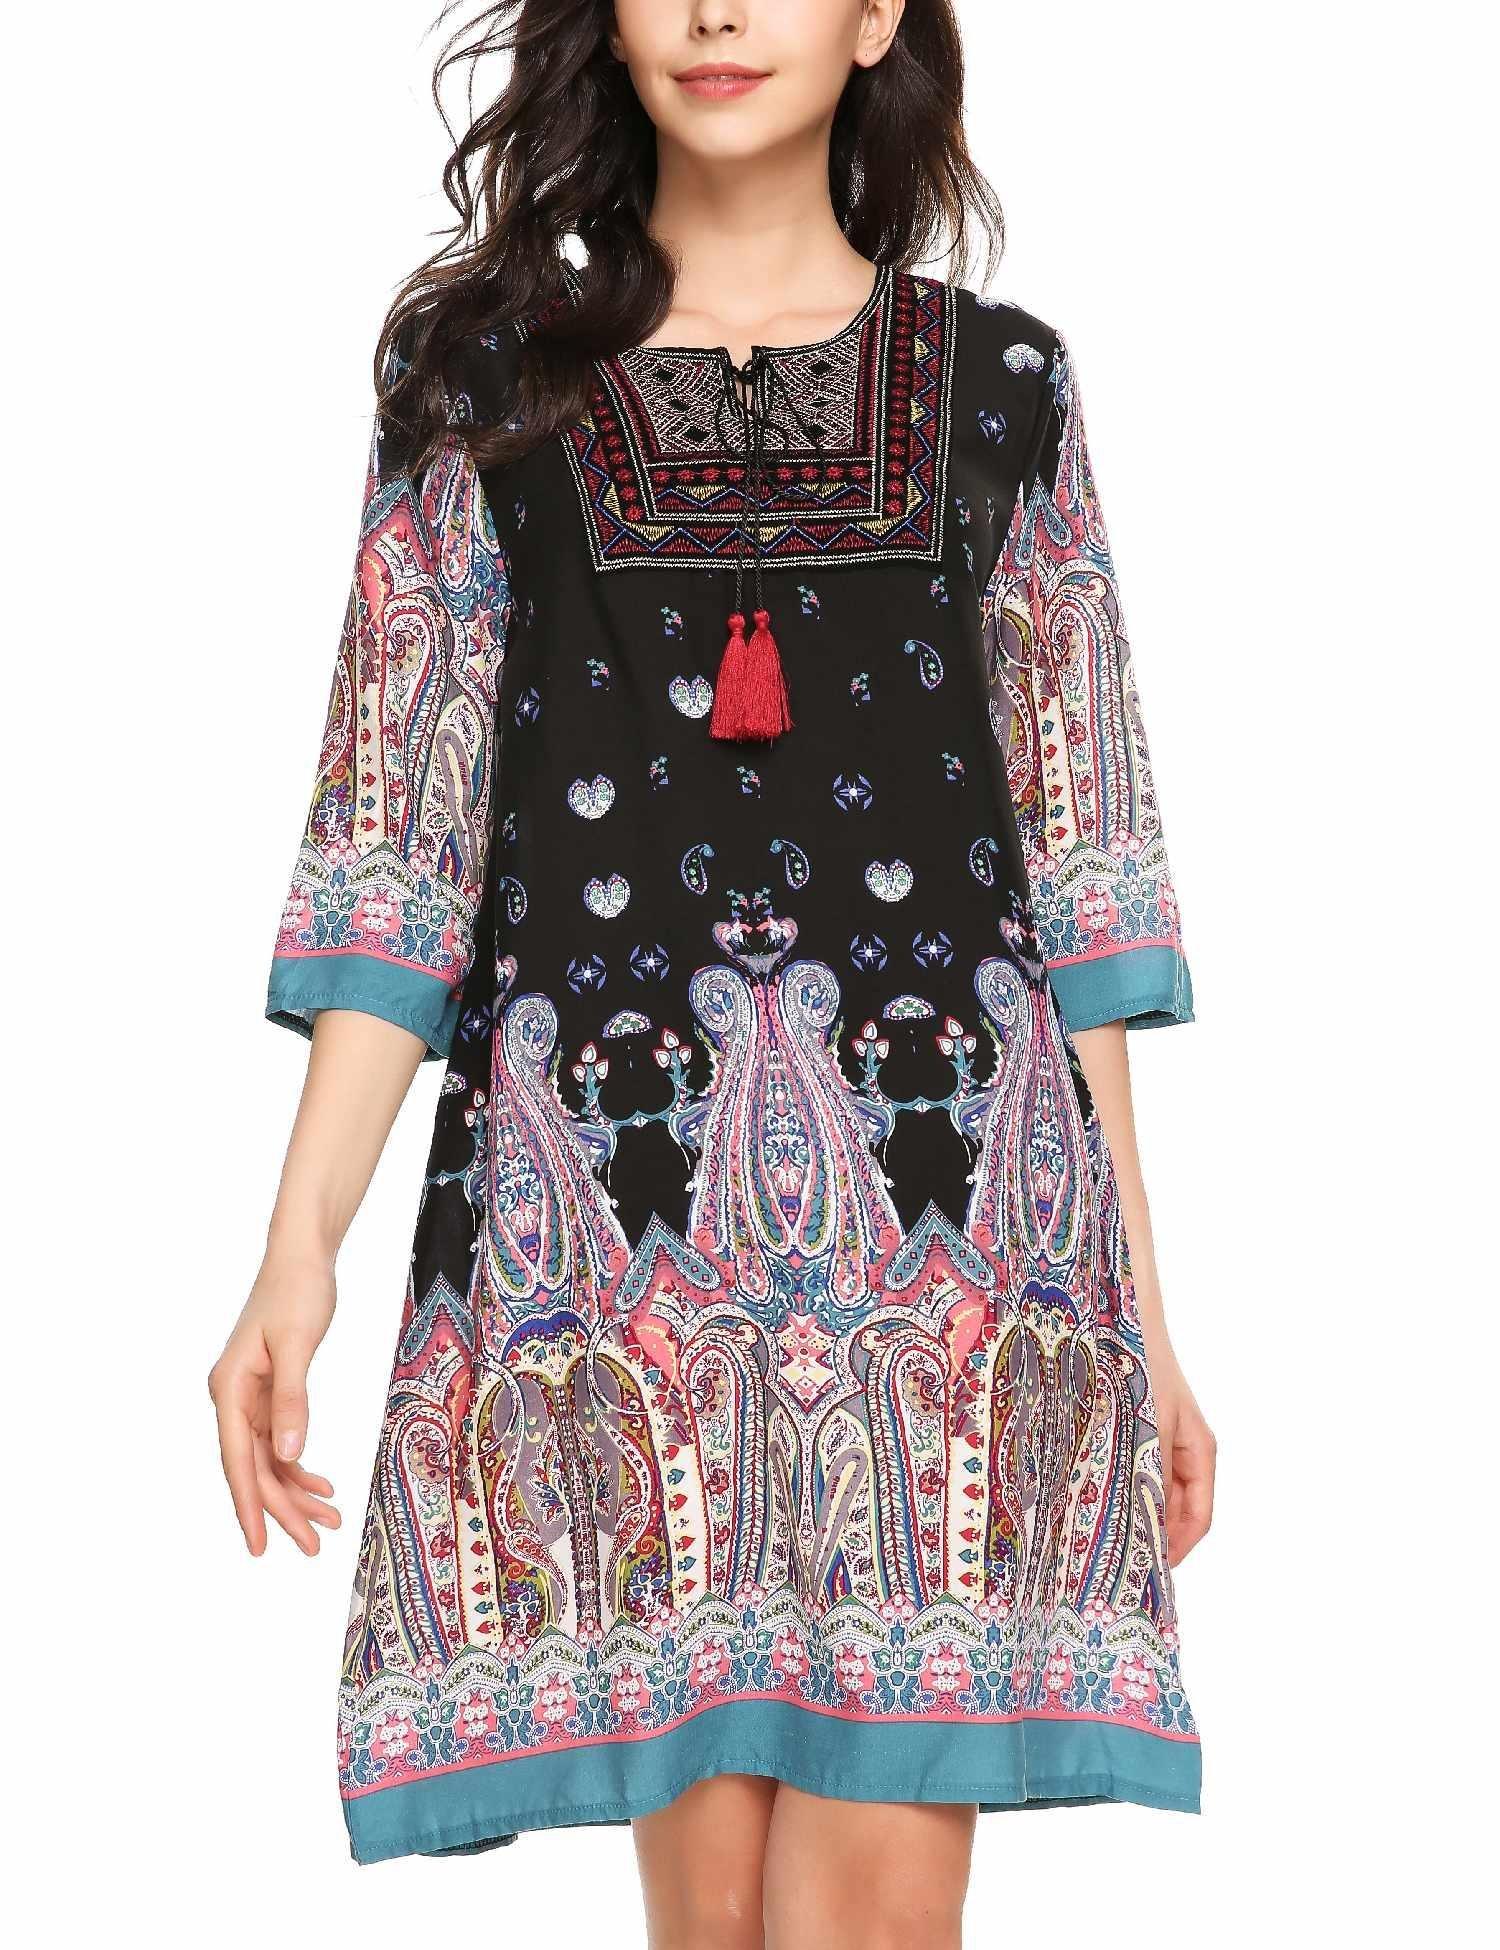 ELESOL Women's 3/4 Sleeve Ethnic Style Bohemian Printed Mini Floral Tunic Dress Dark Blue S